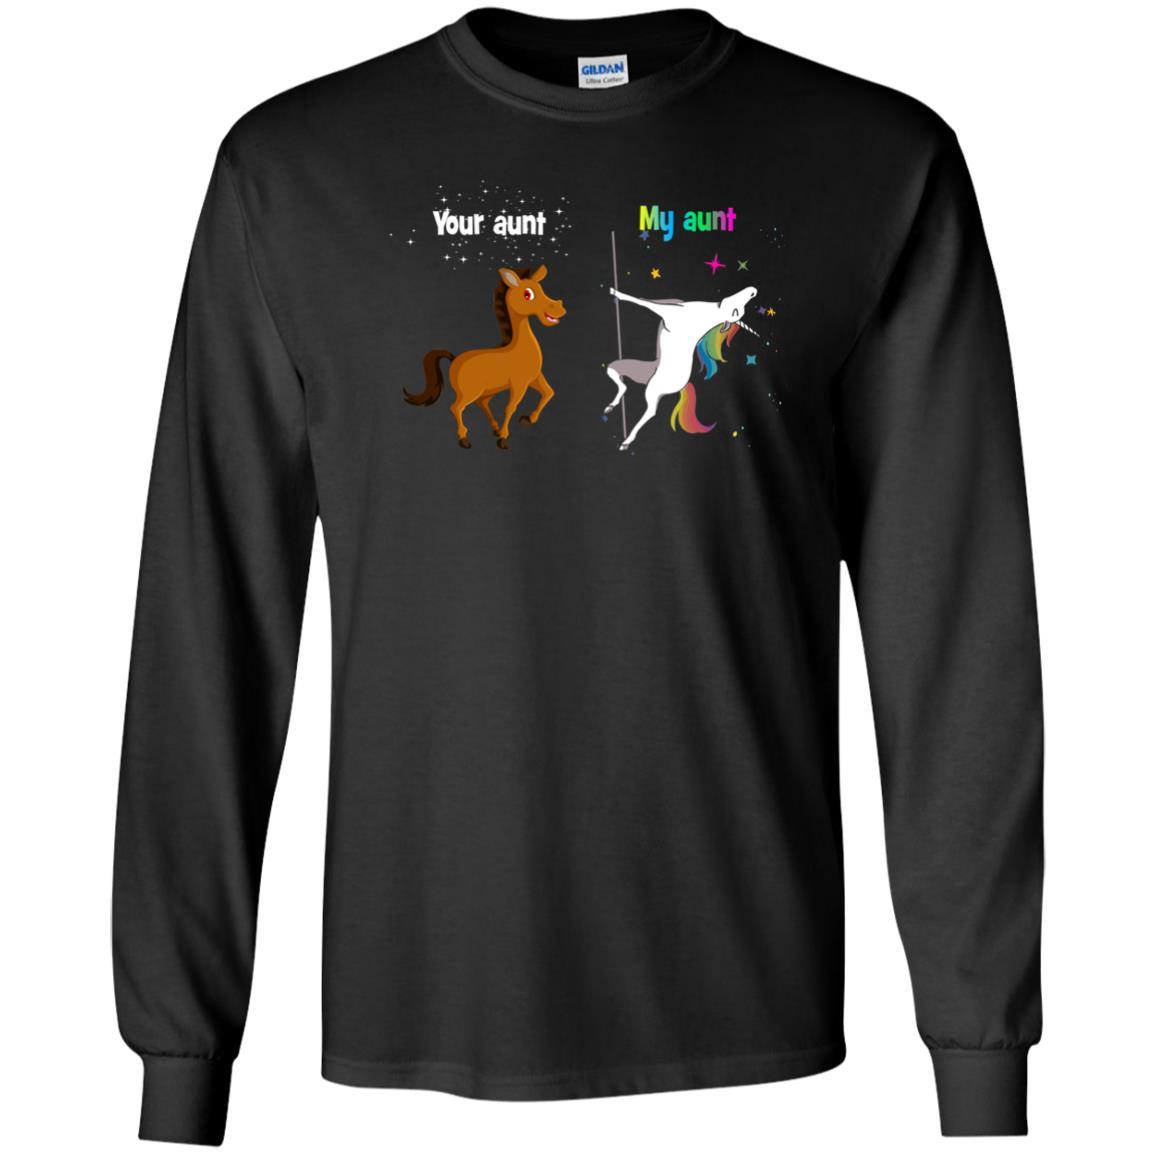 image 937px My aunt unicorn vs your aunt horse t shirt, hoodies, tank top